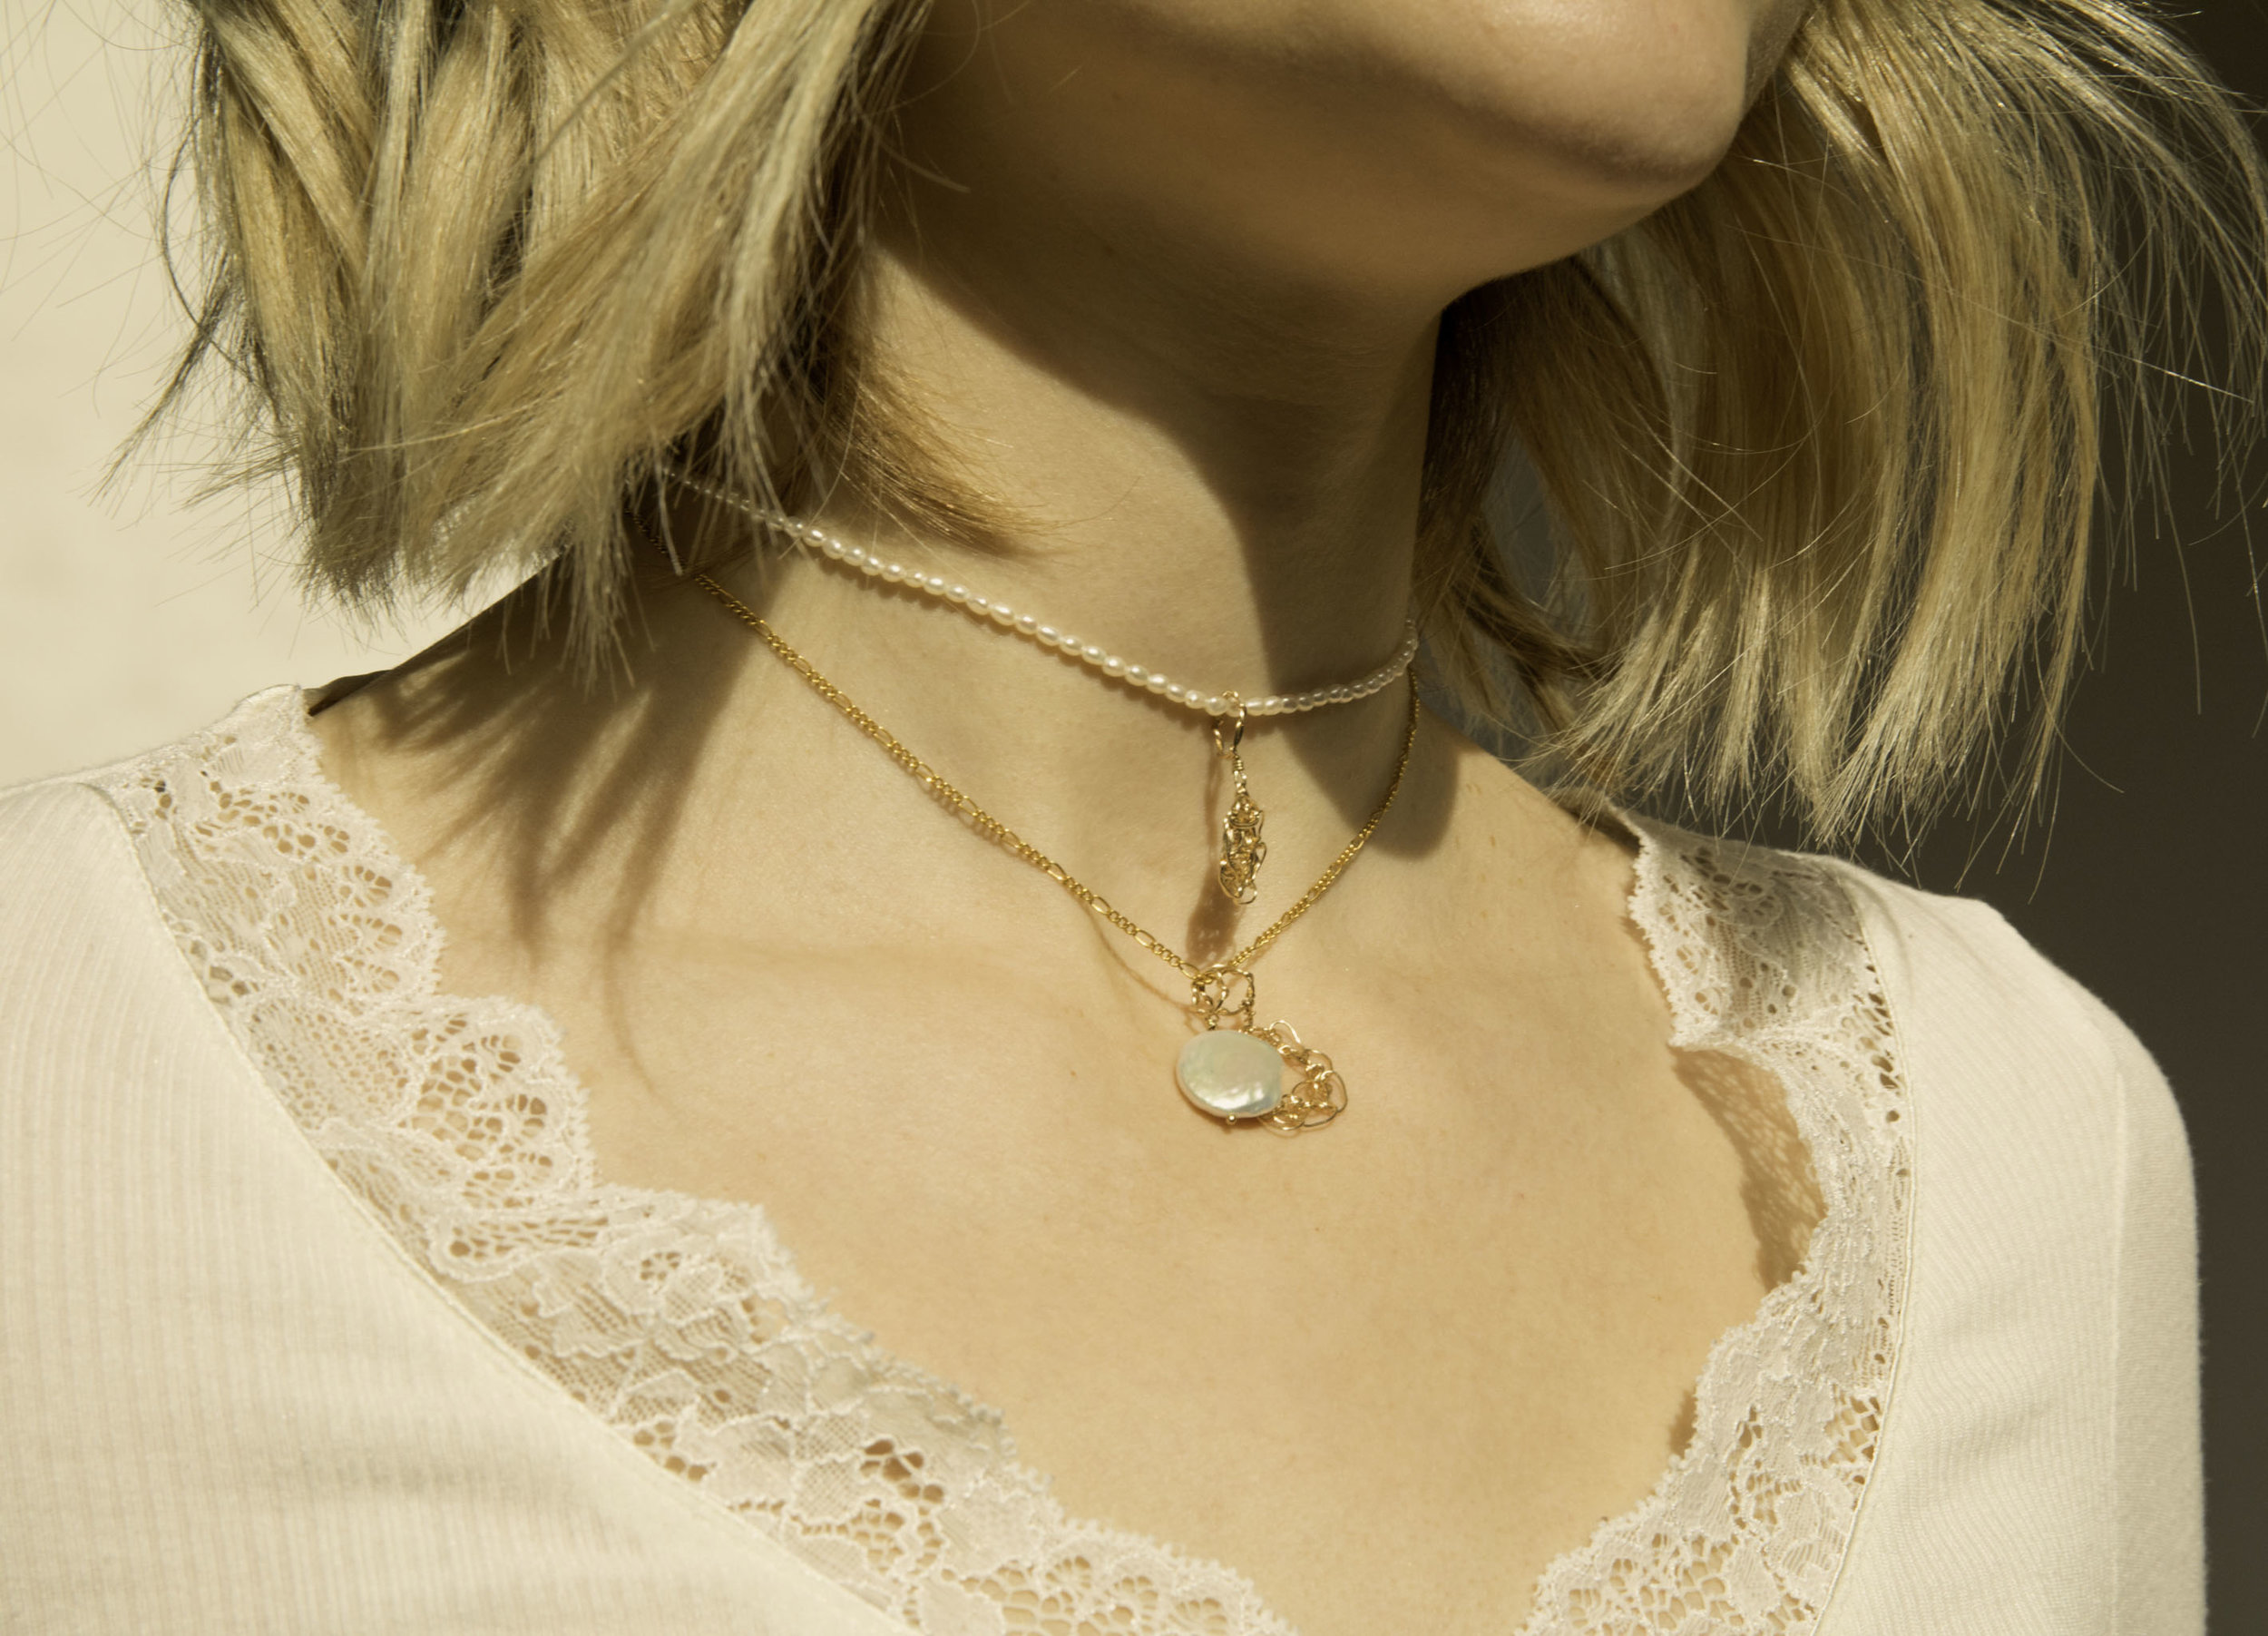 ALKYMI-Bea necklace Julia necklace & charms.jpg